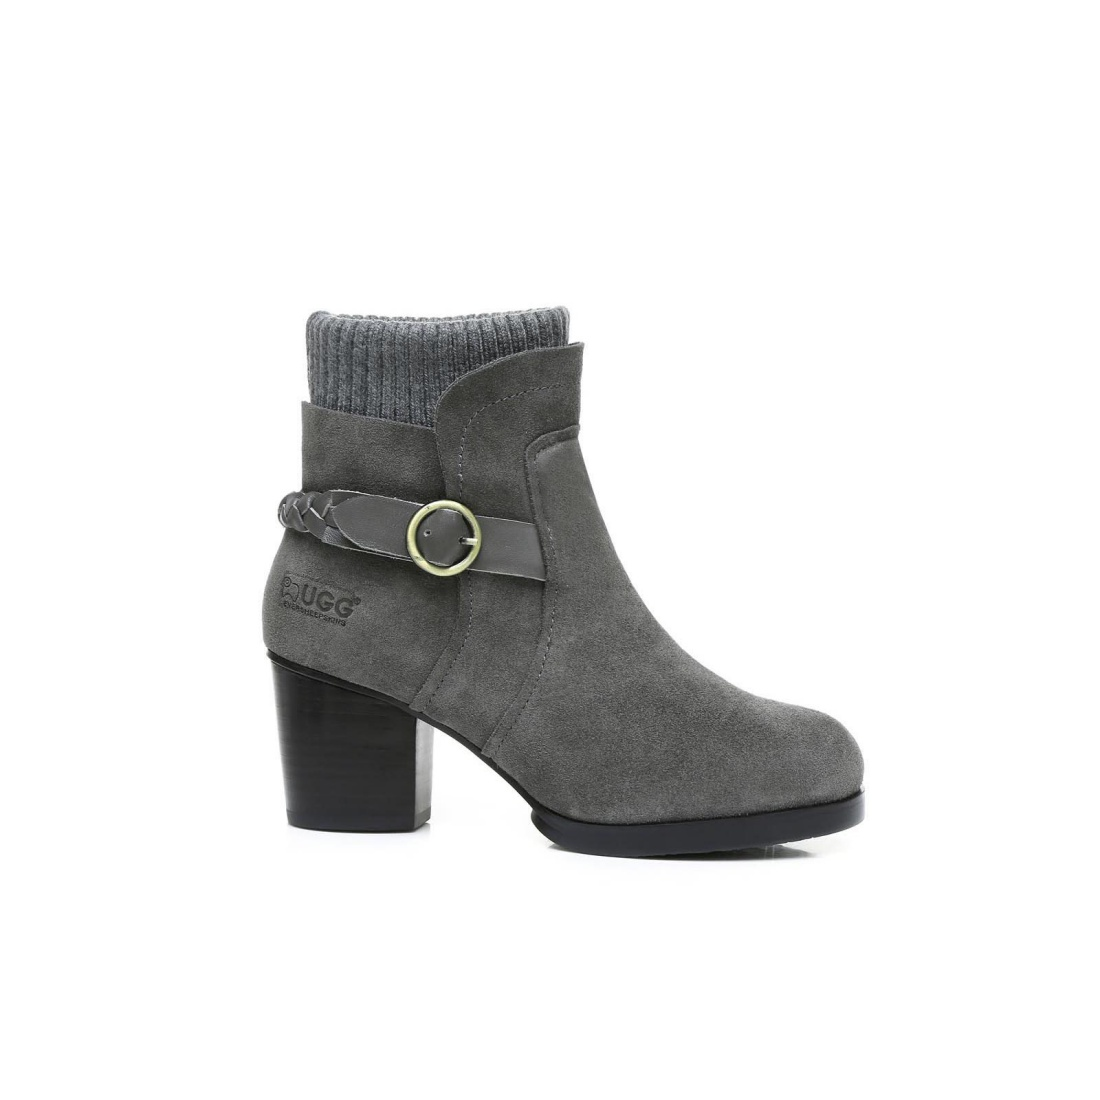 UGG High Heel Boots - Grey - AU Women 4 / Men 2